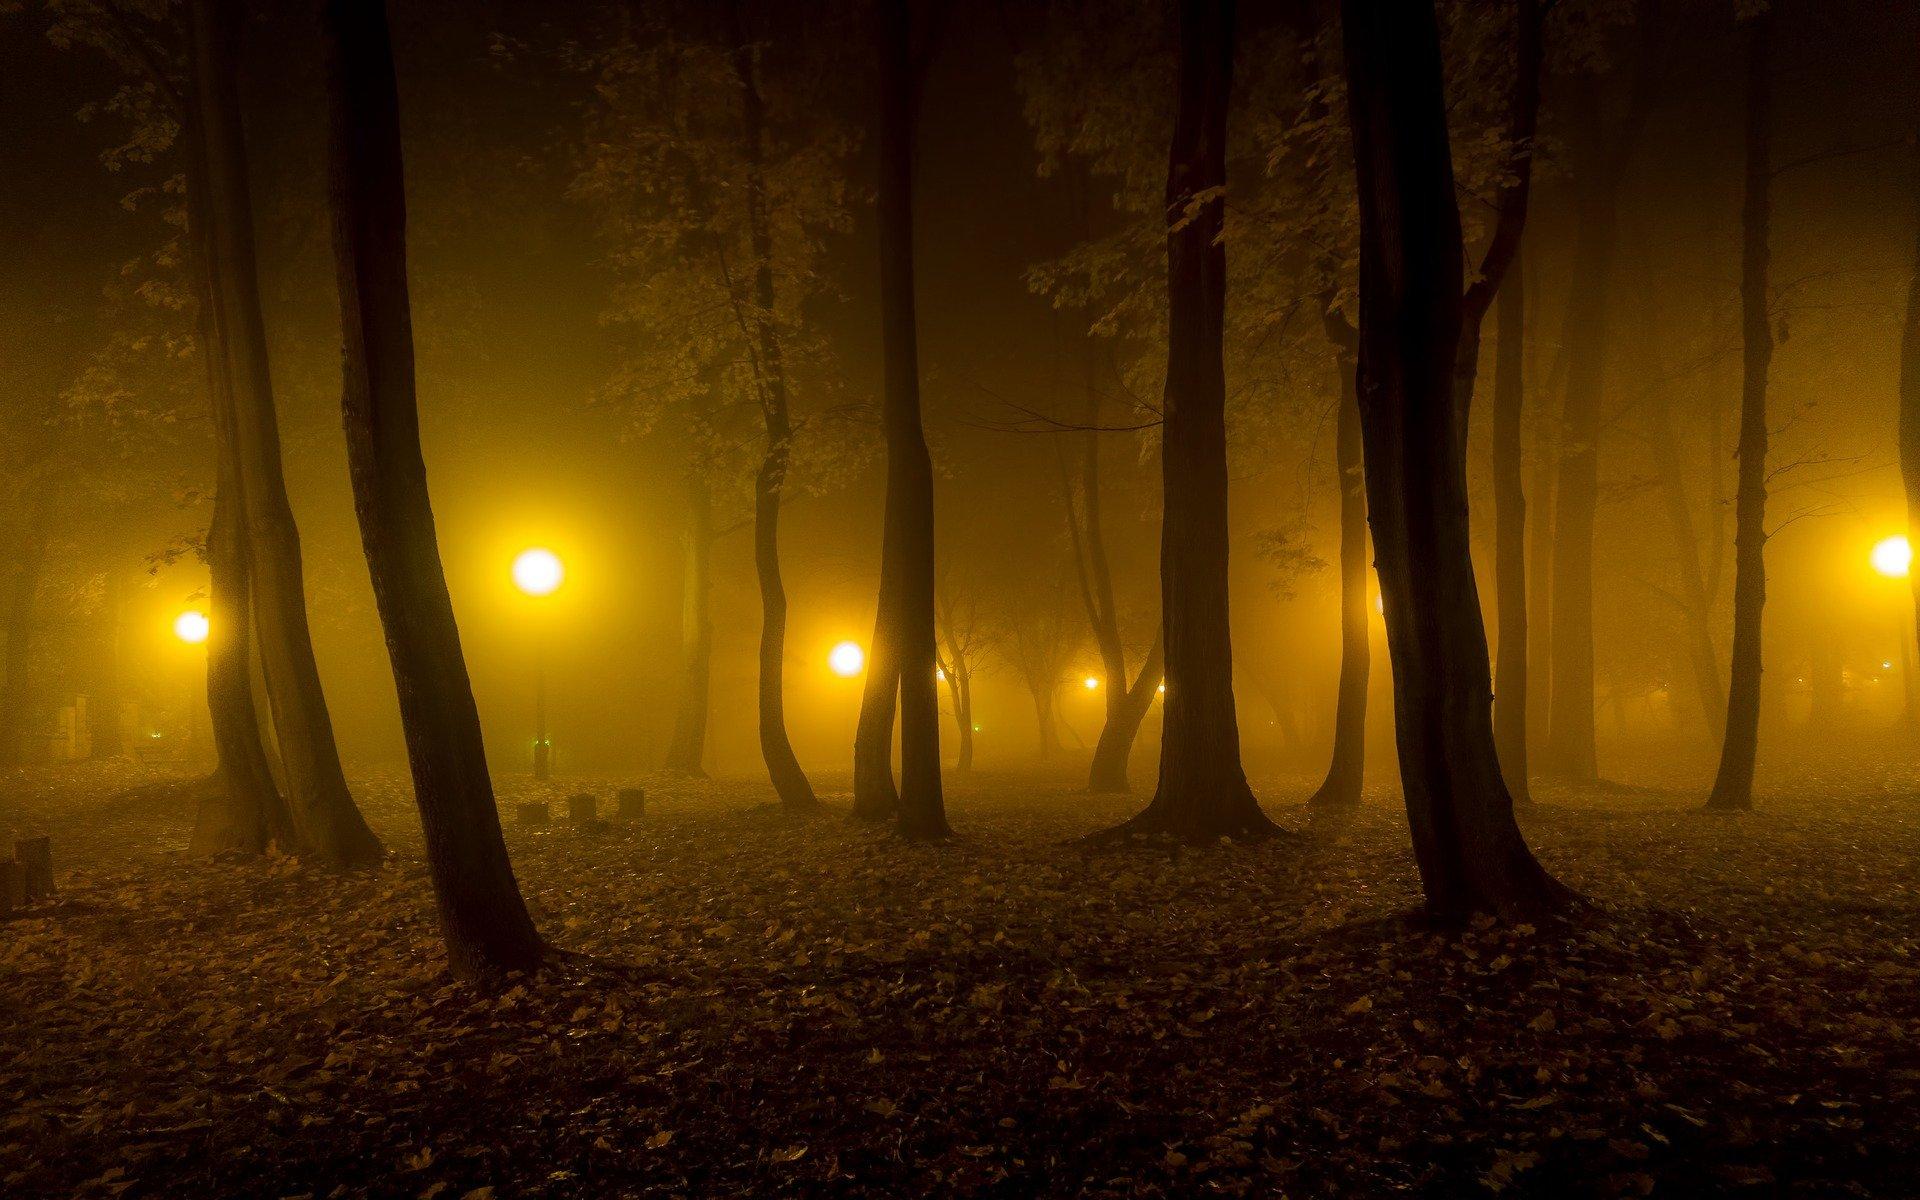 Smart Lights Will Soon Illuminate City Parks